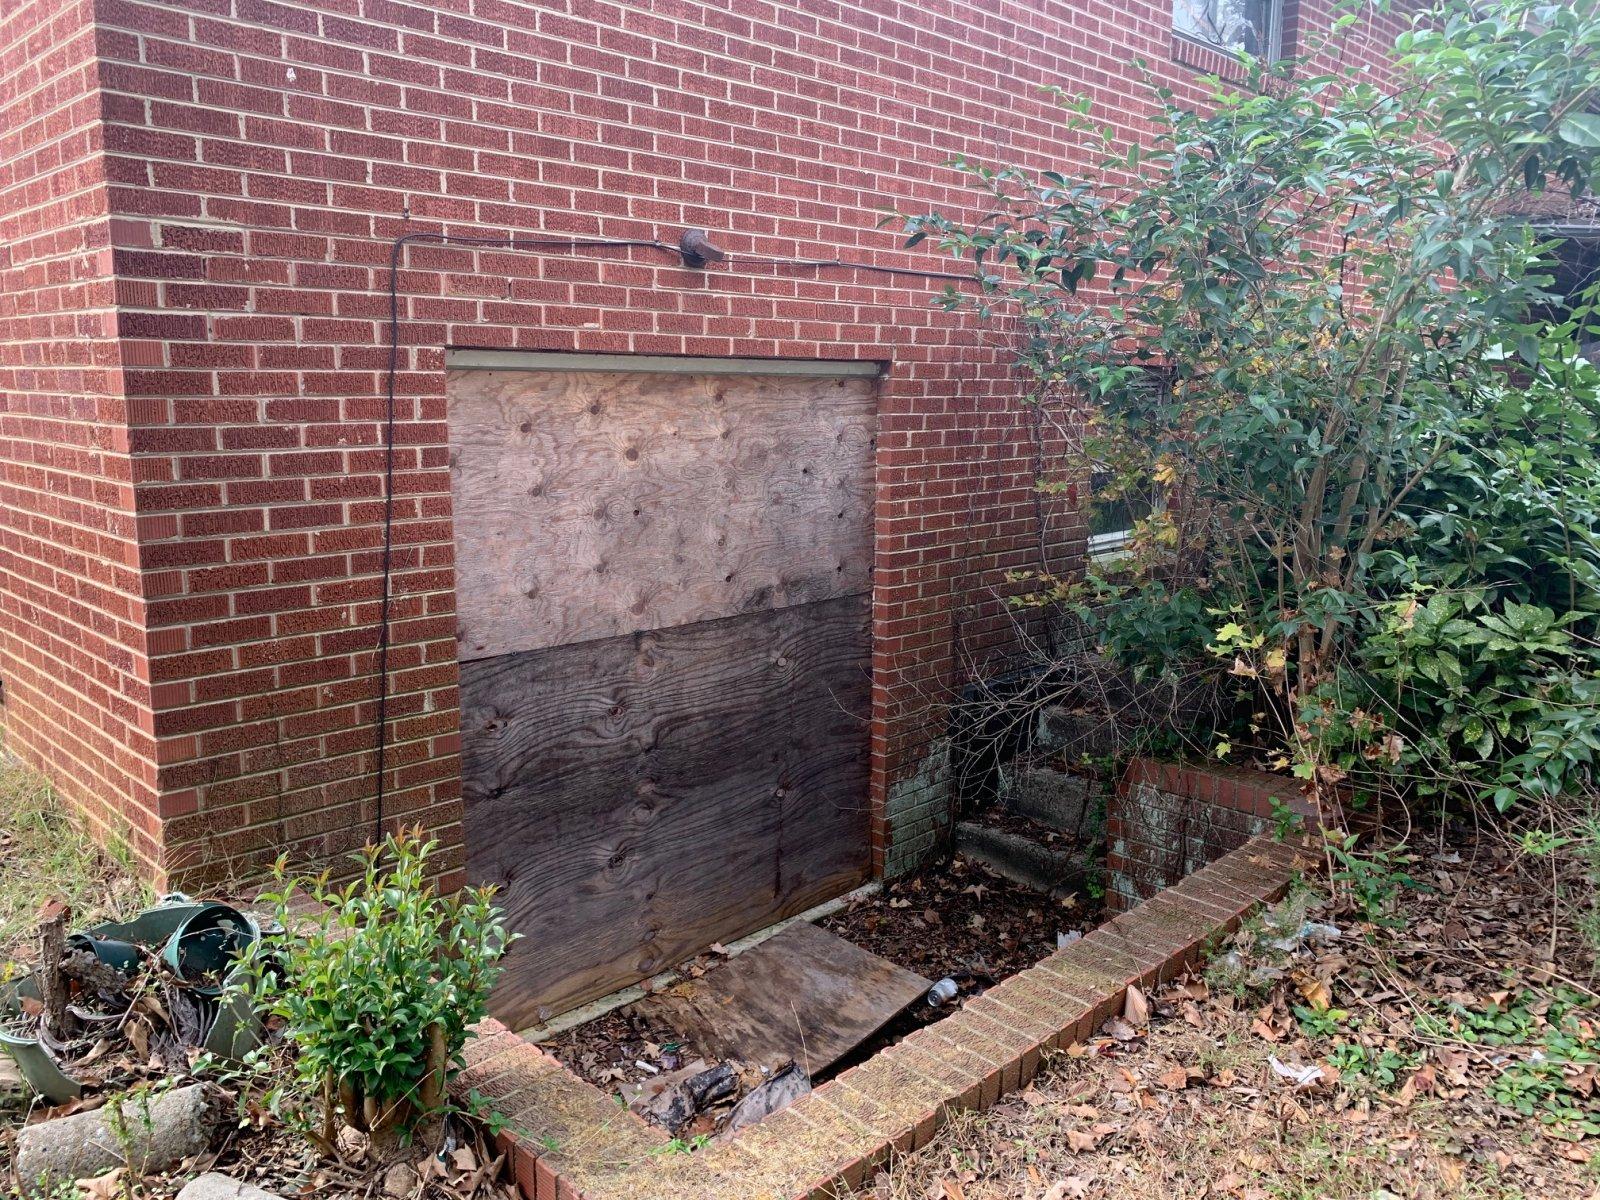 Off Market Deal Contractor Special in Greensboro NC